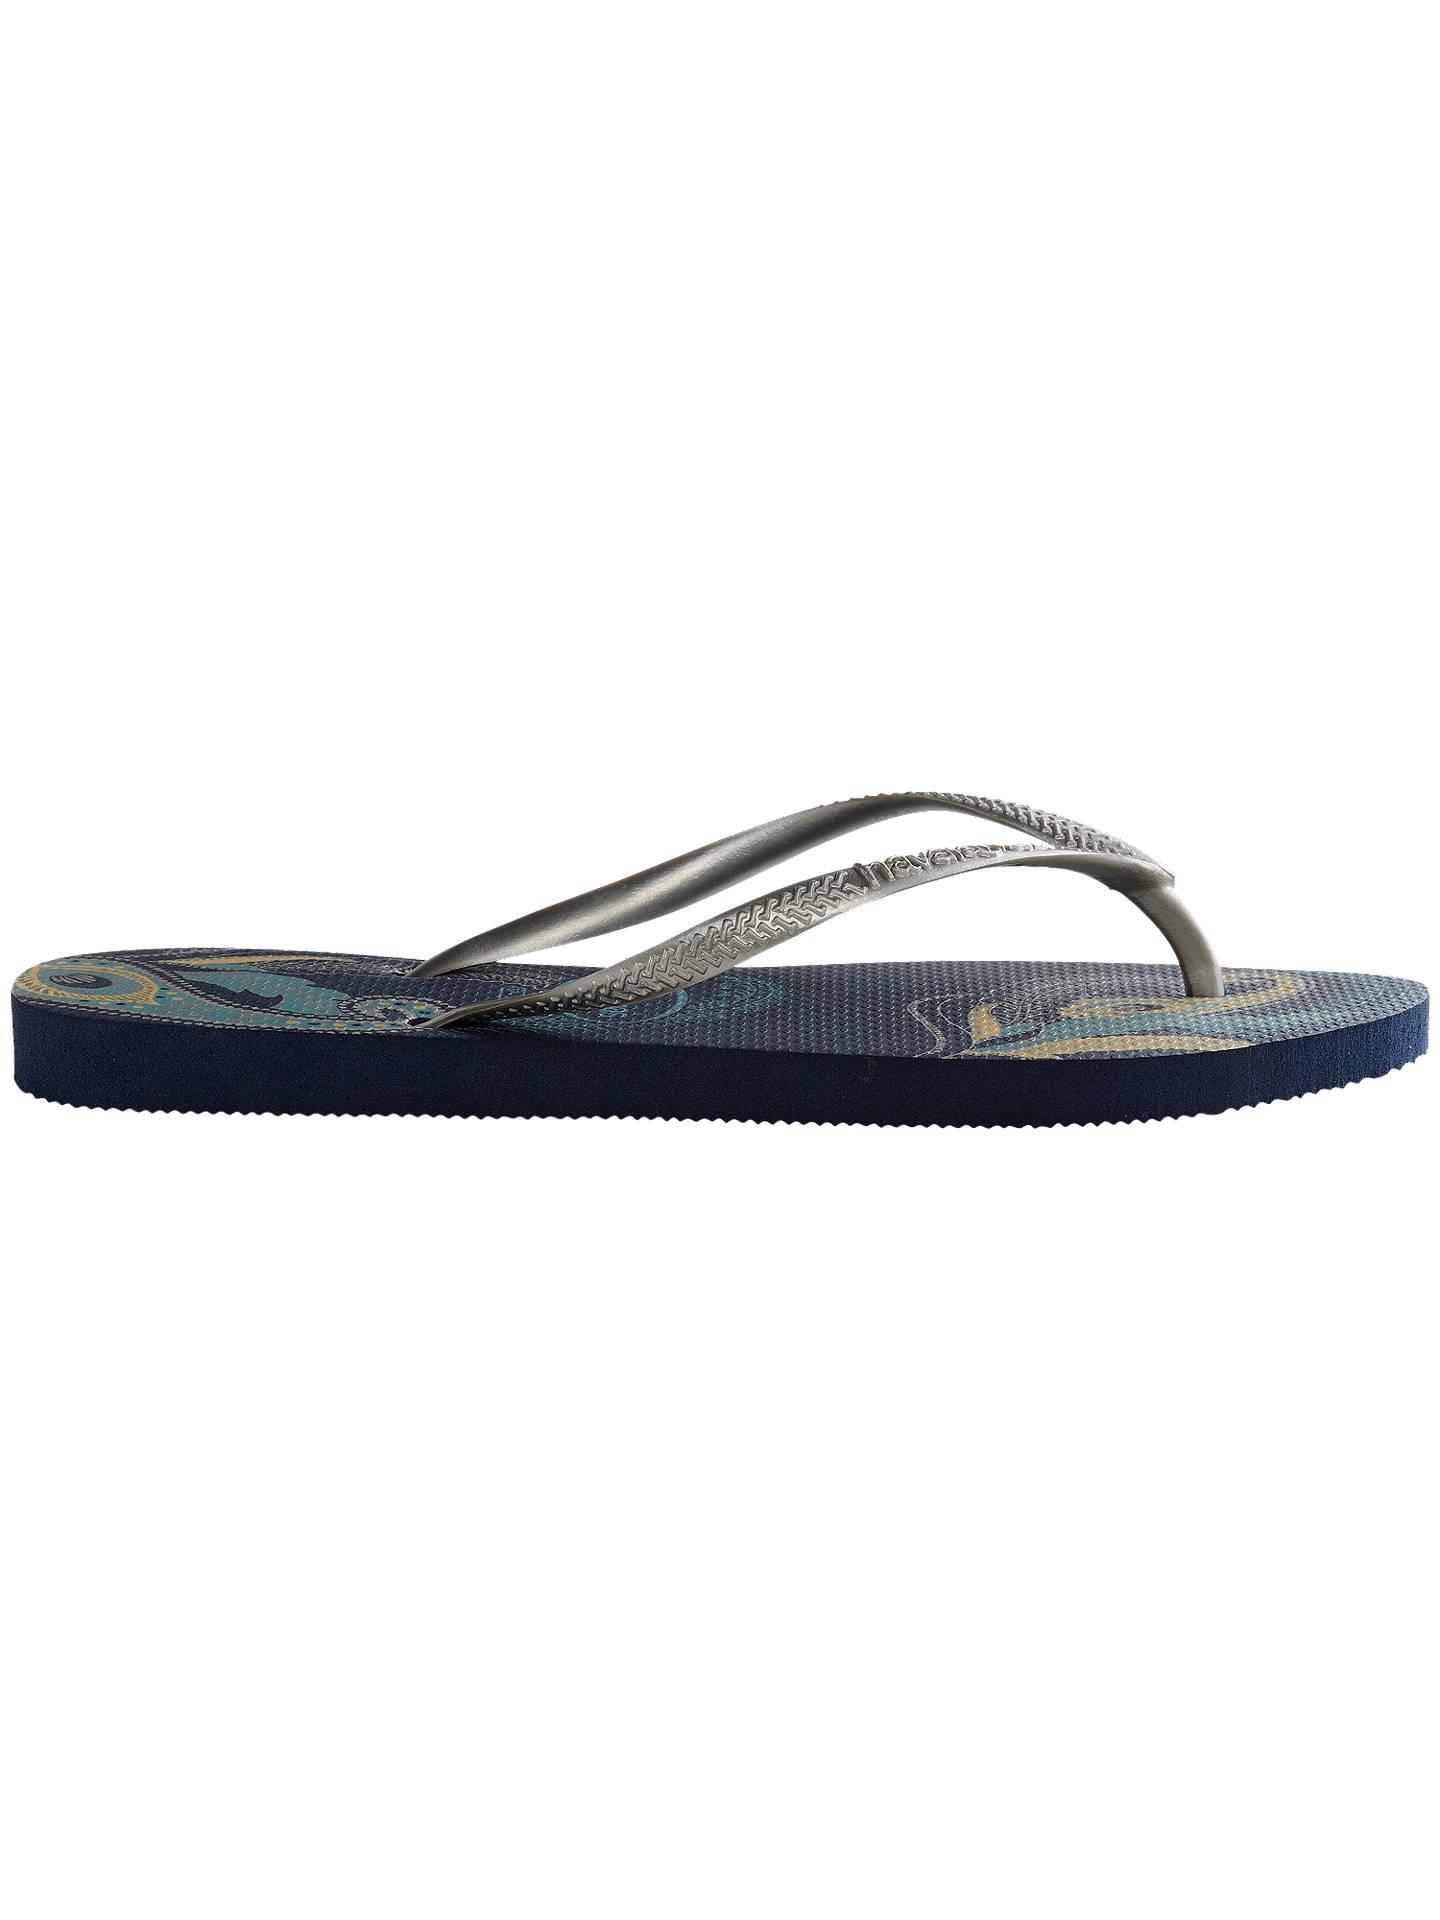 6b2e17307 Buy Havaianas Slim Organic Flip Flops